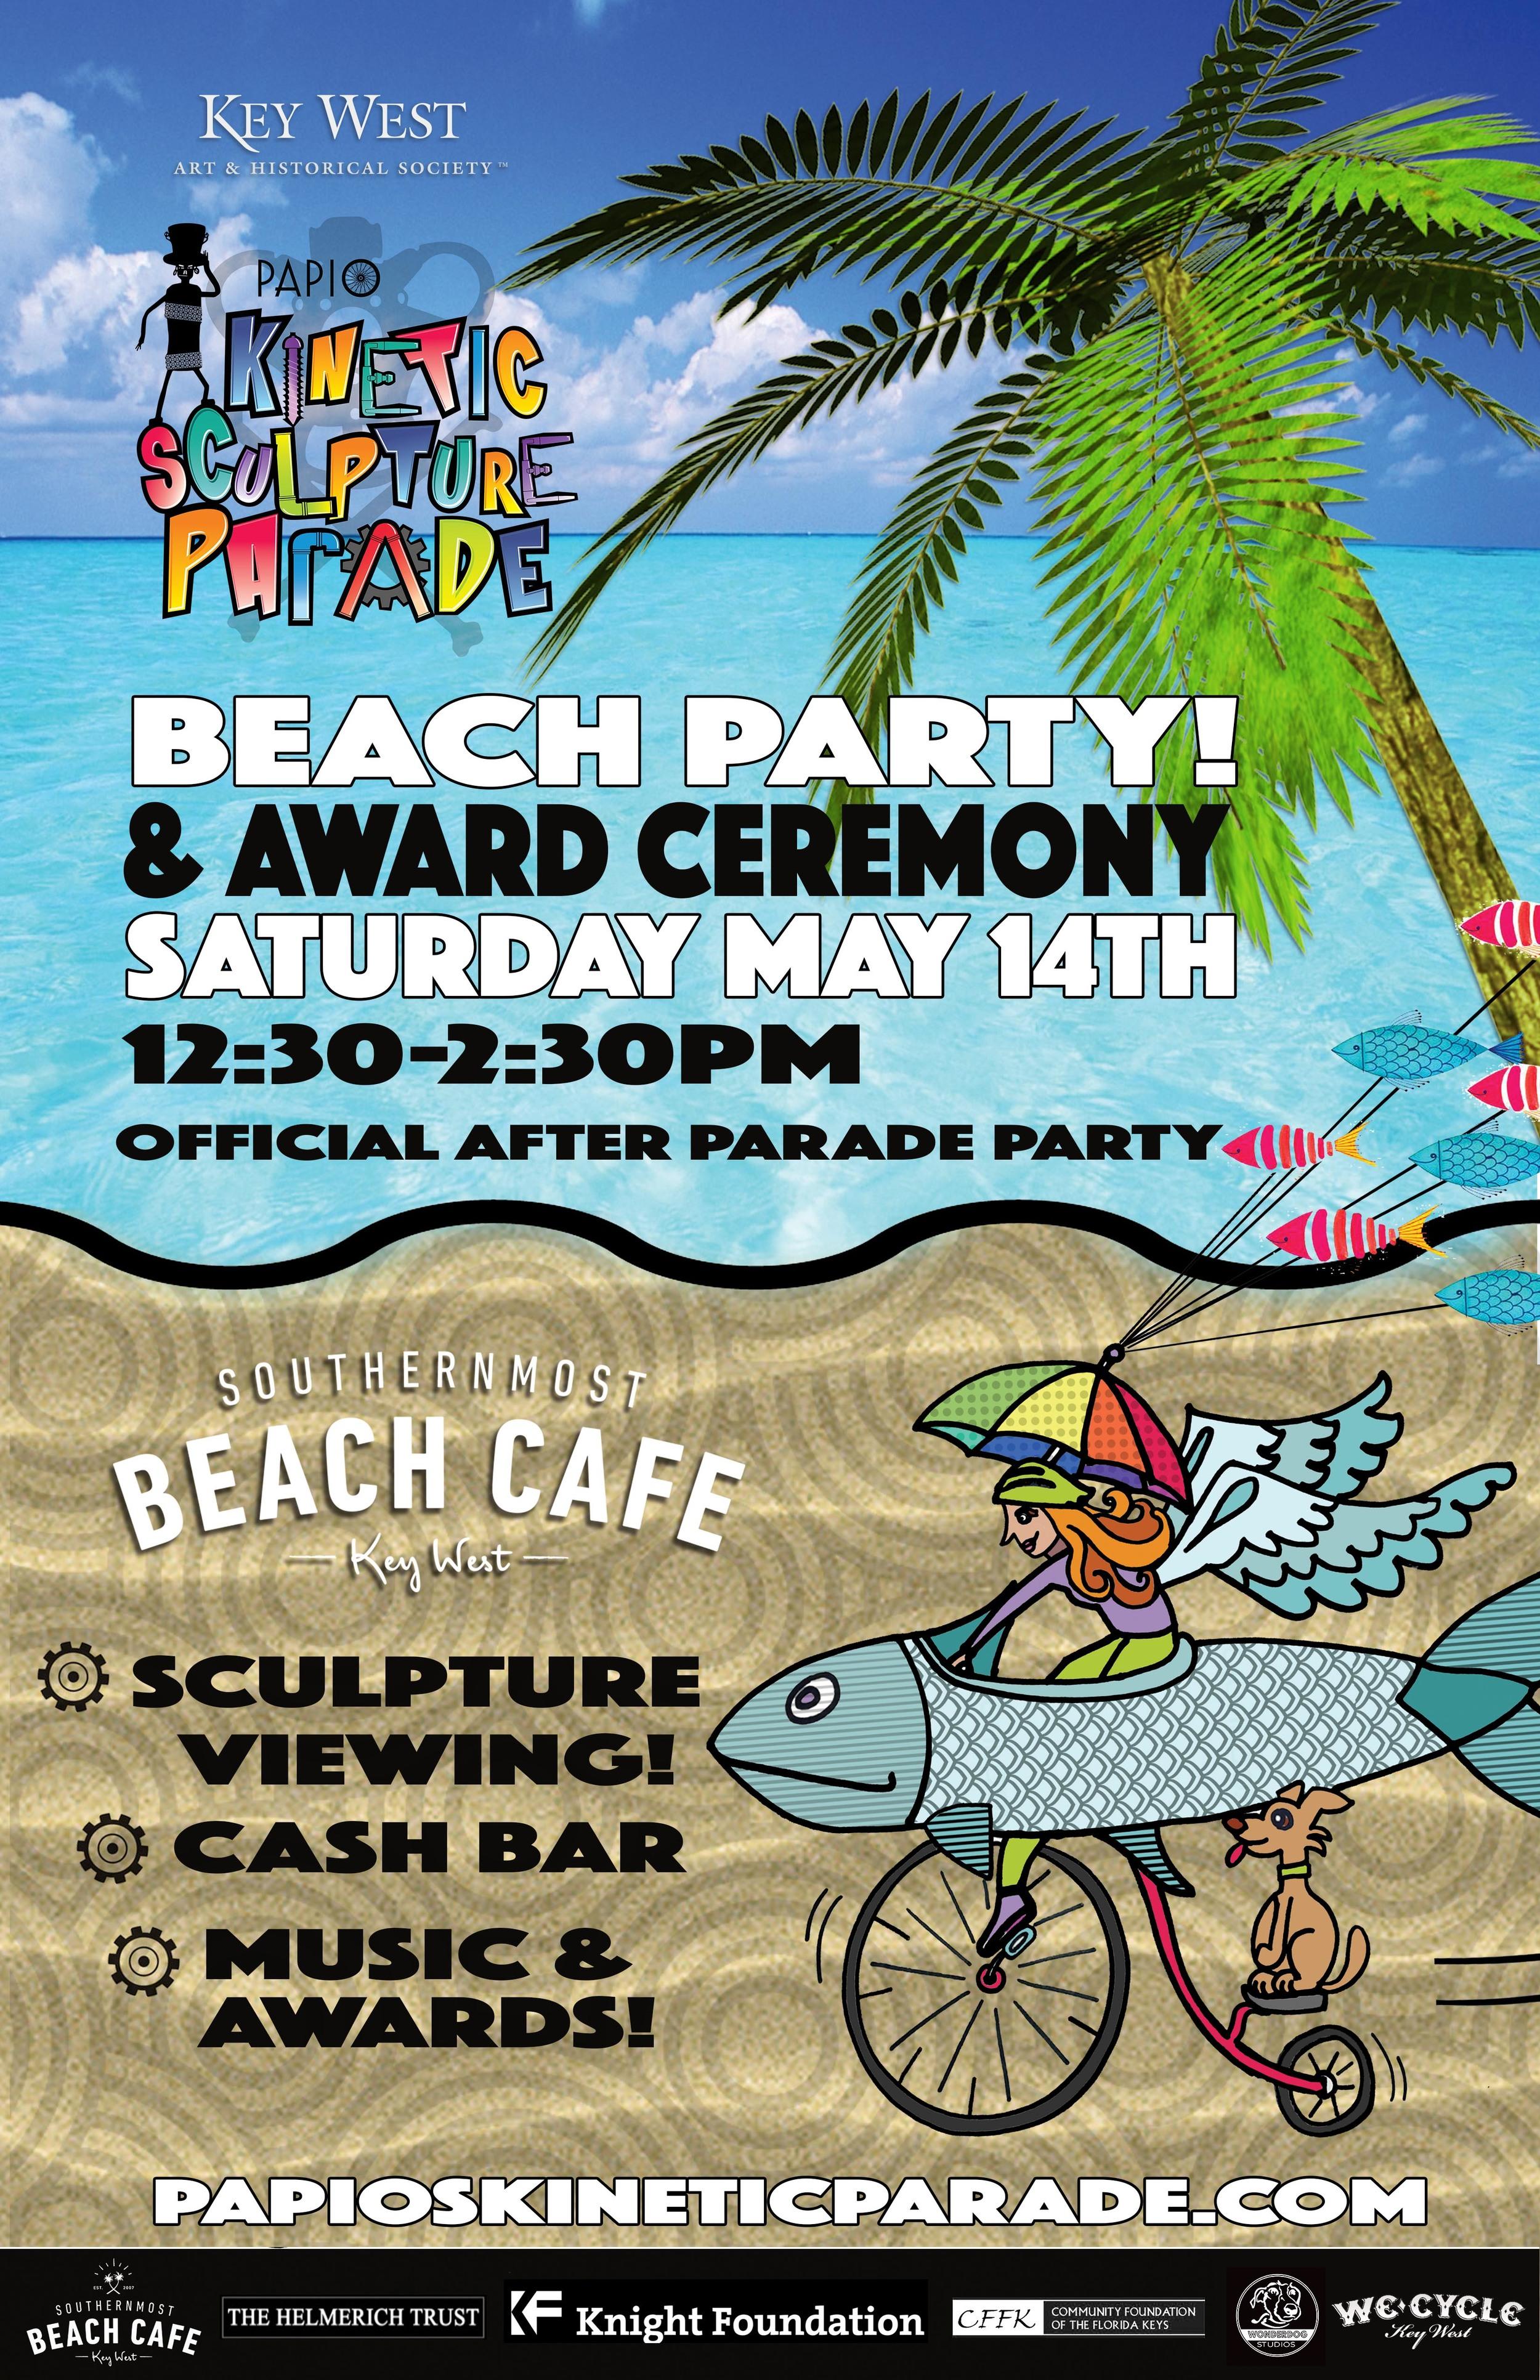 Papios_Beach Party Poster_11x17 web.jpg